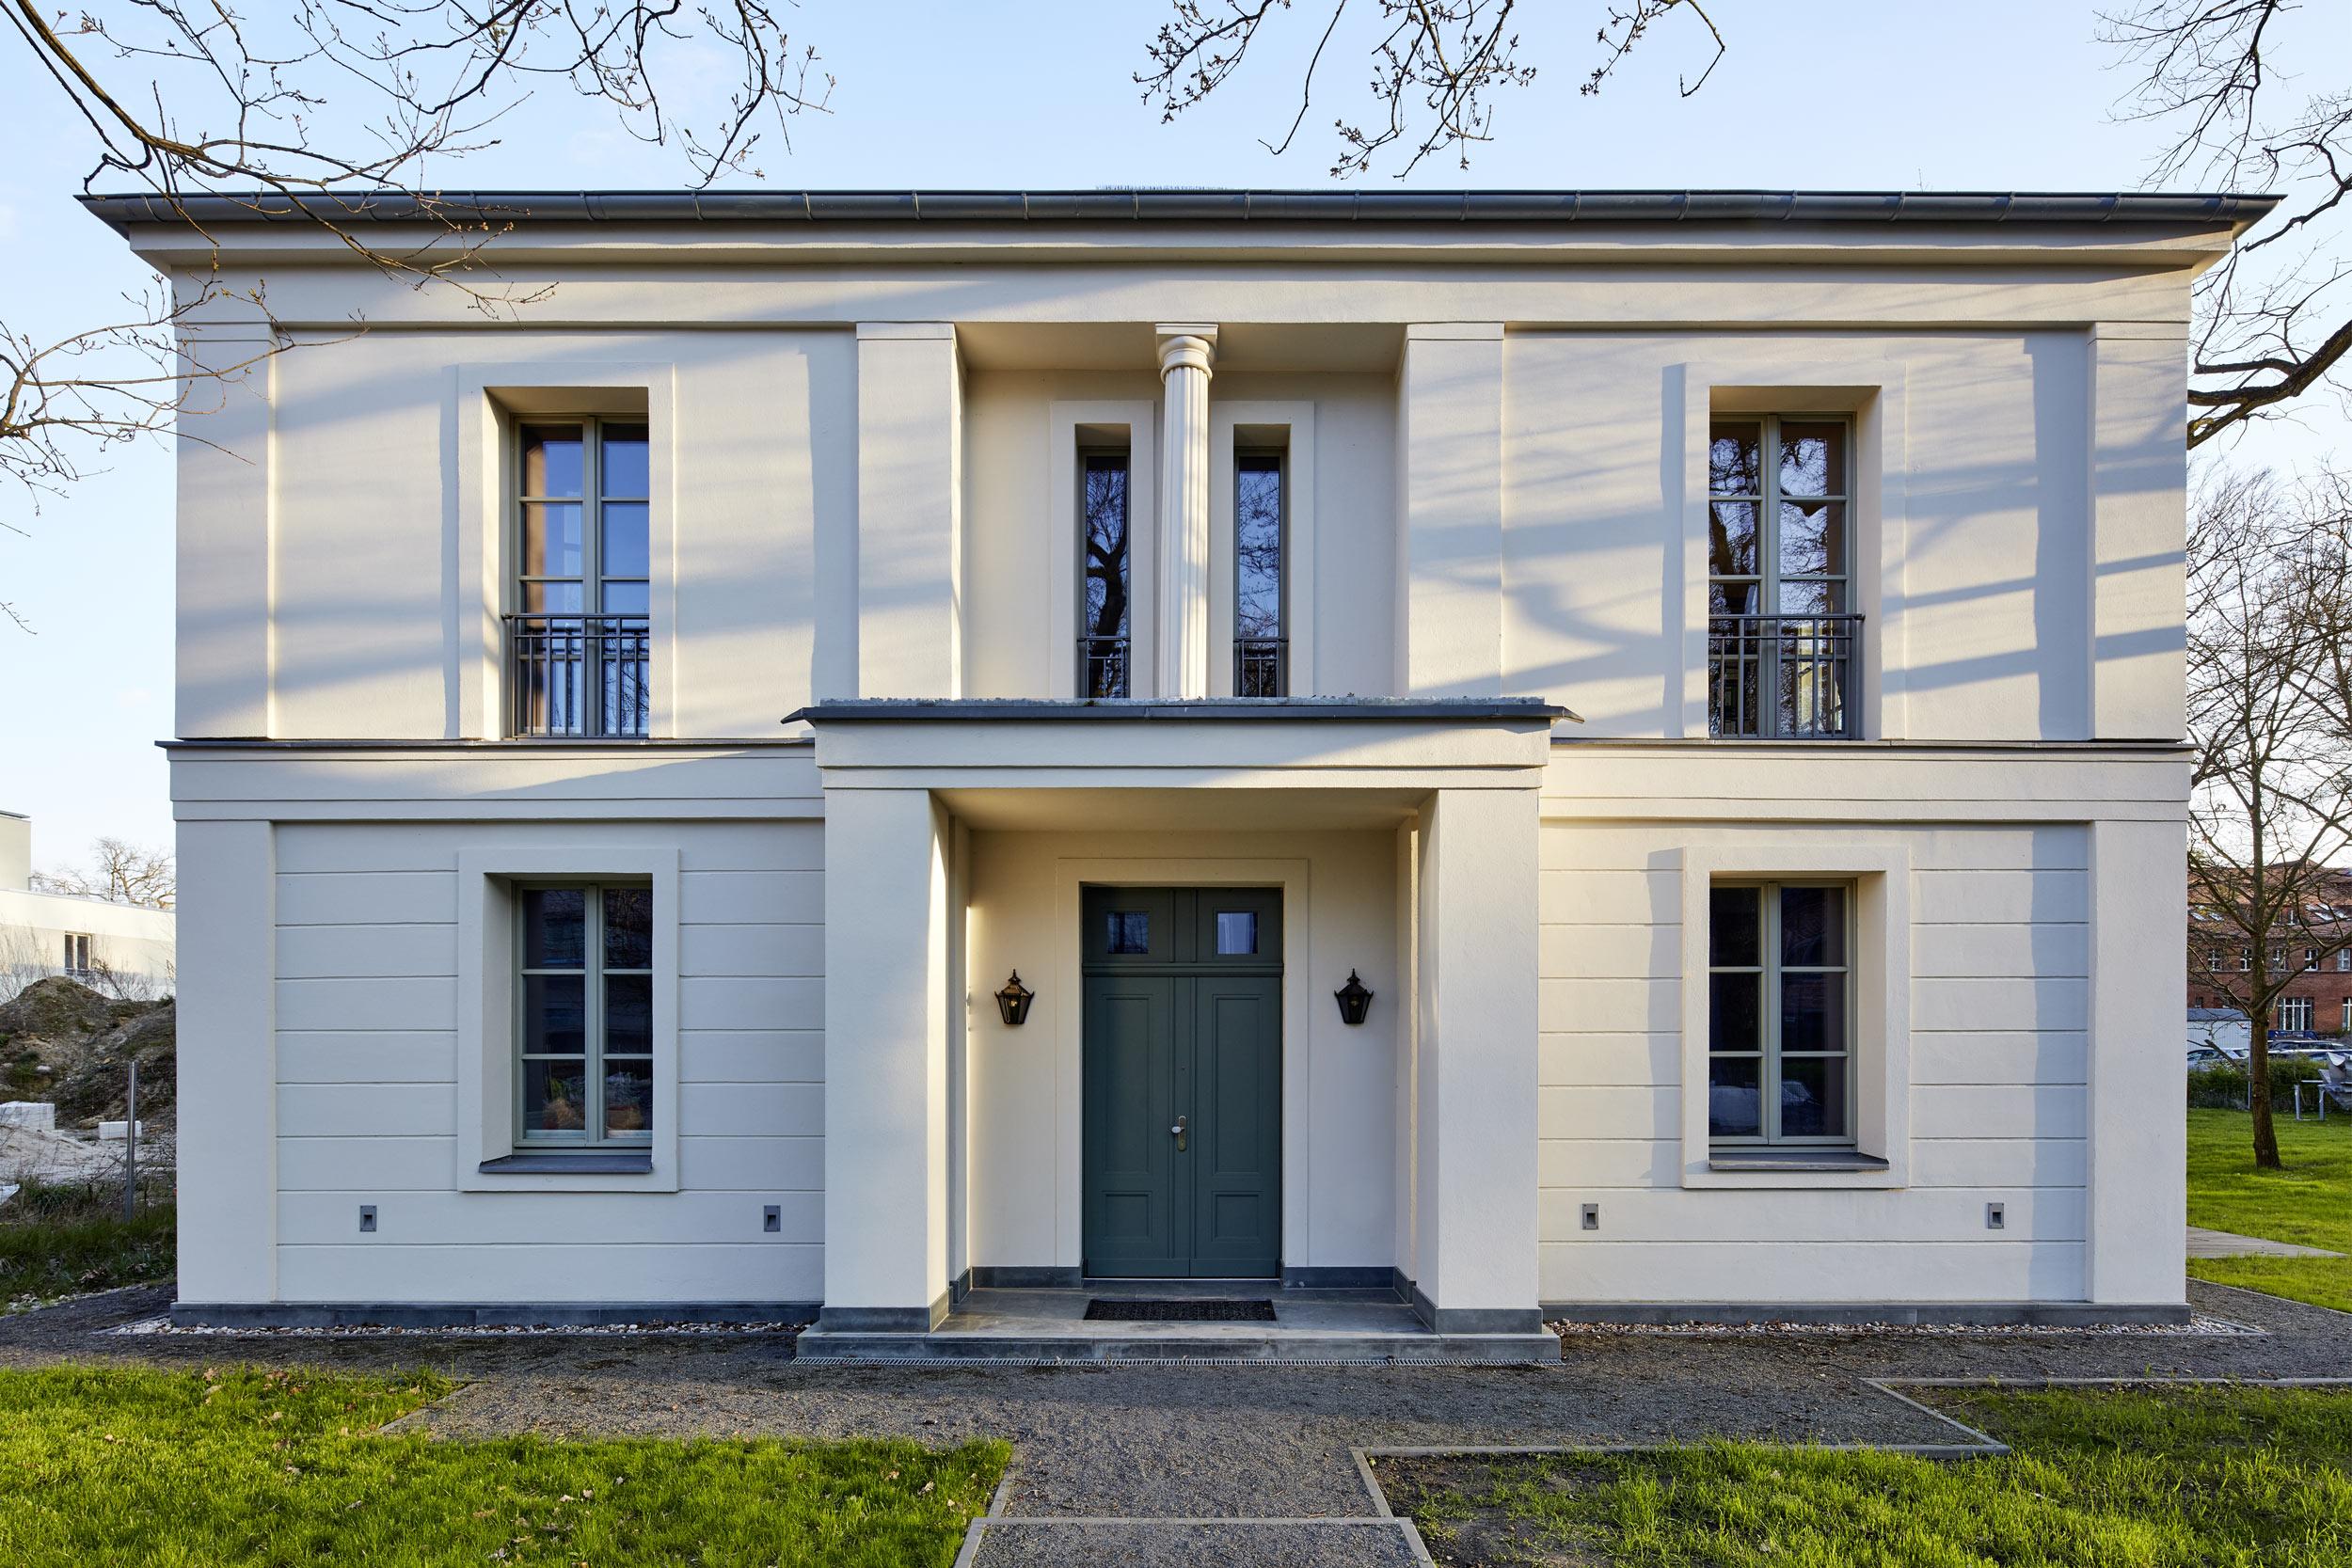 Villa in klassisch traditionellem Baustil - Eingangsportal Vordach Säulen